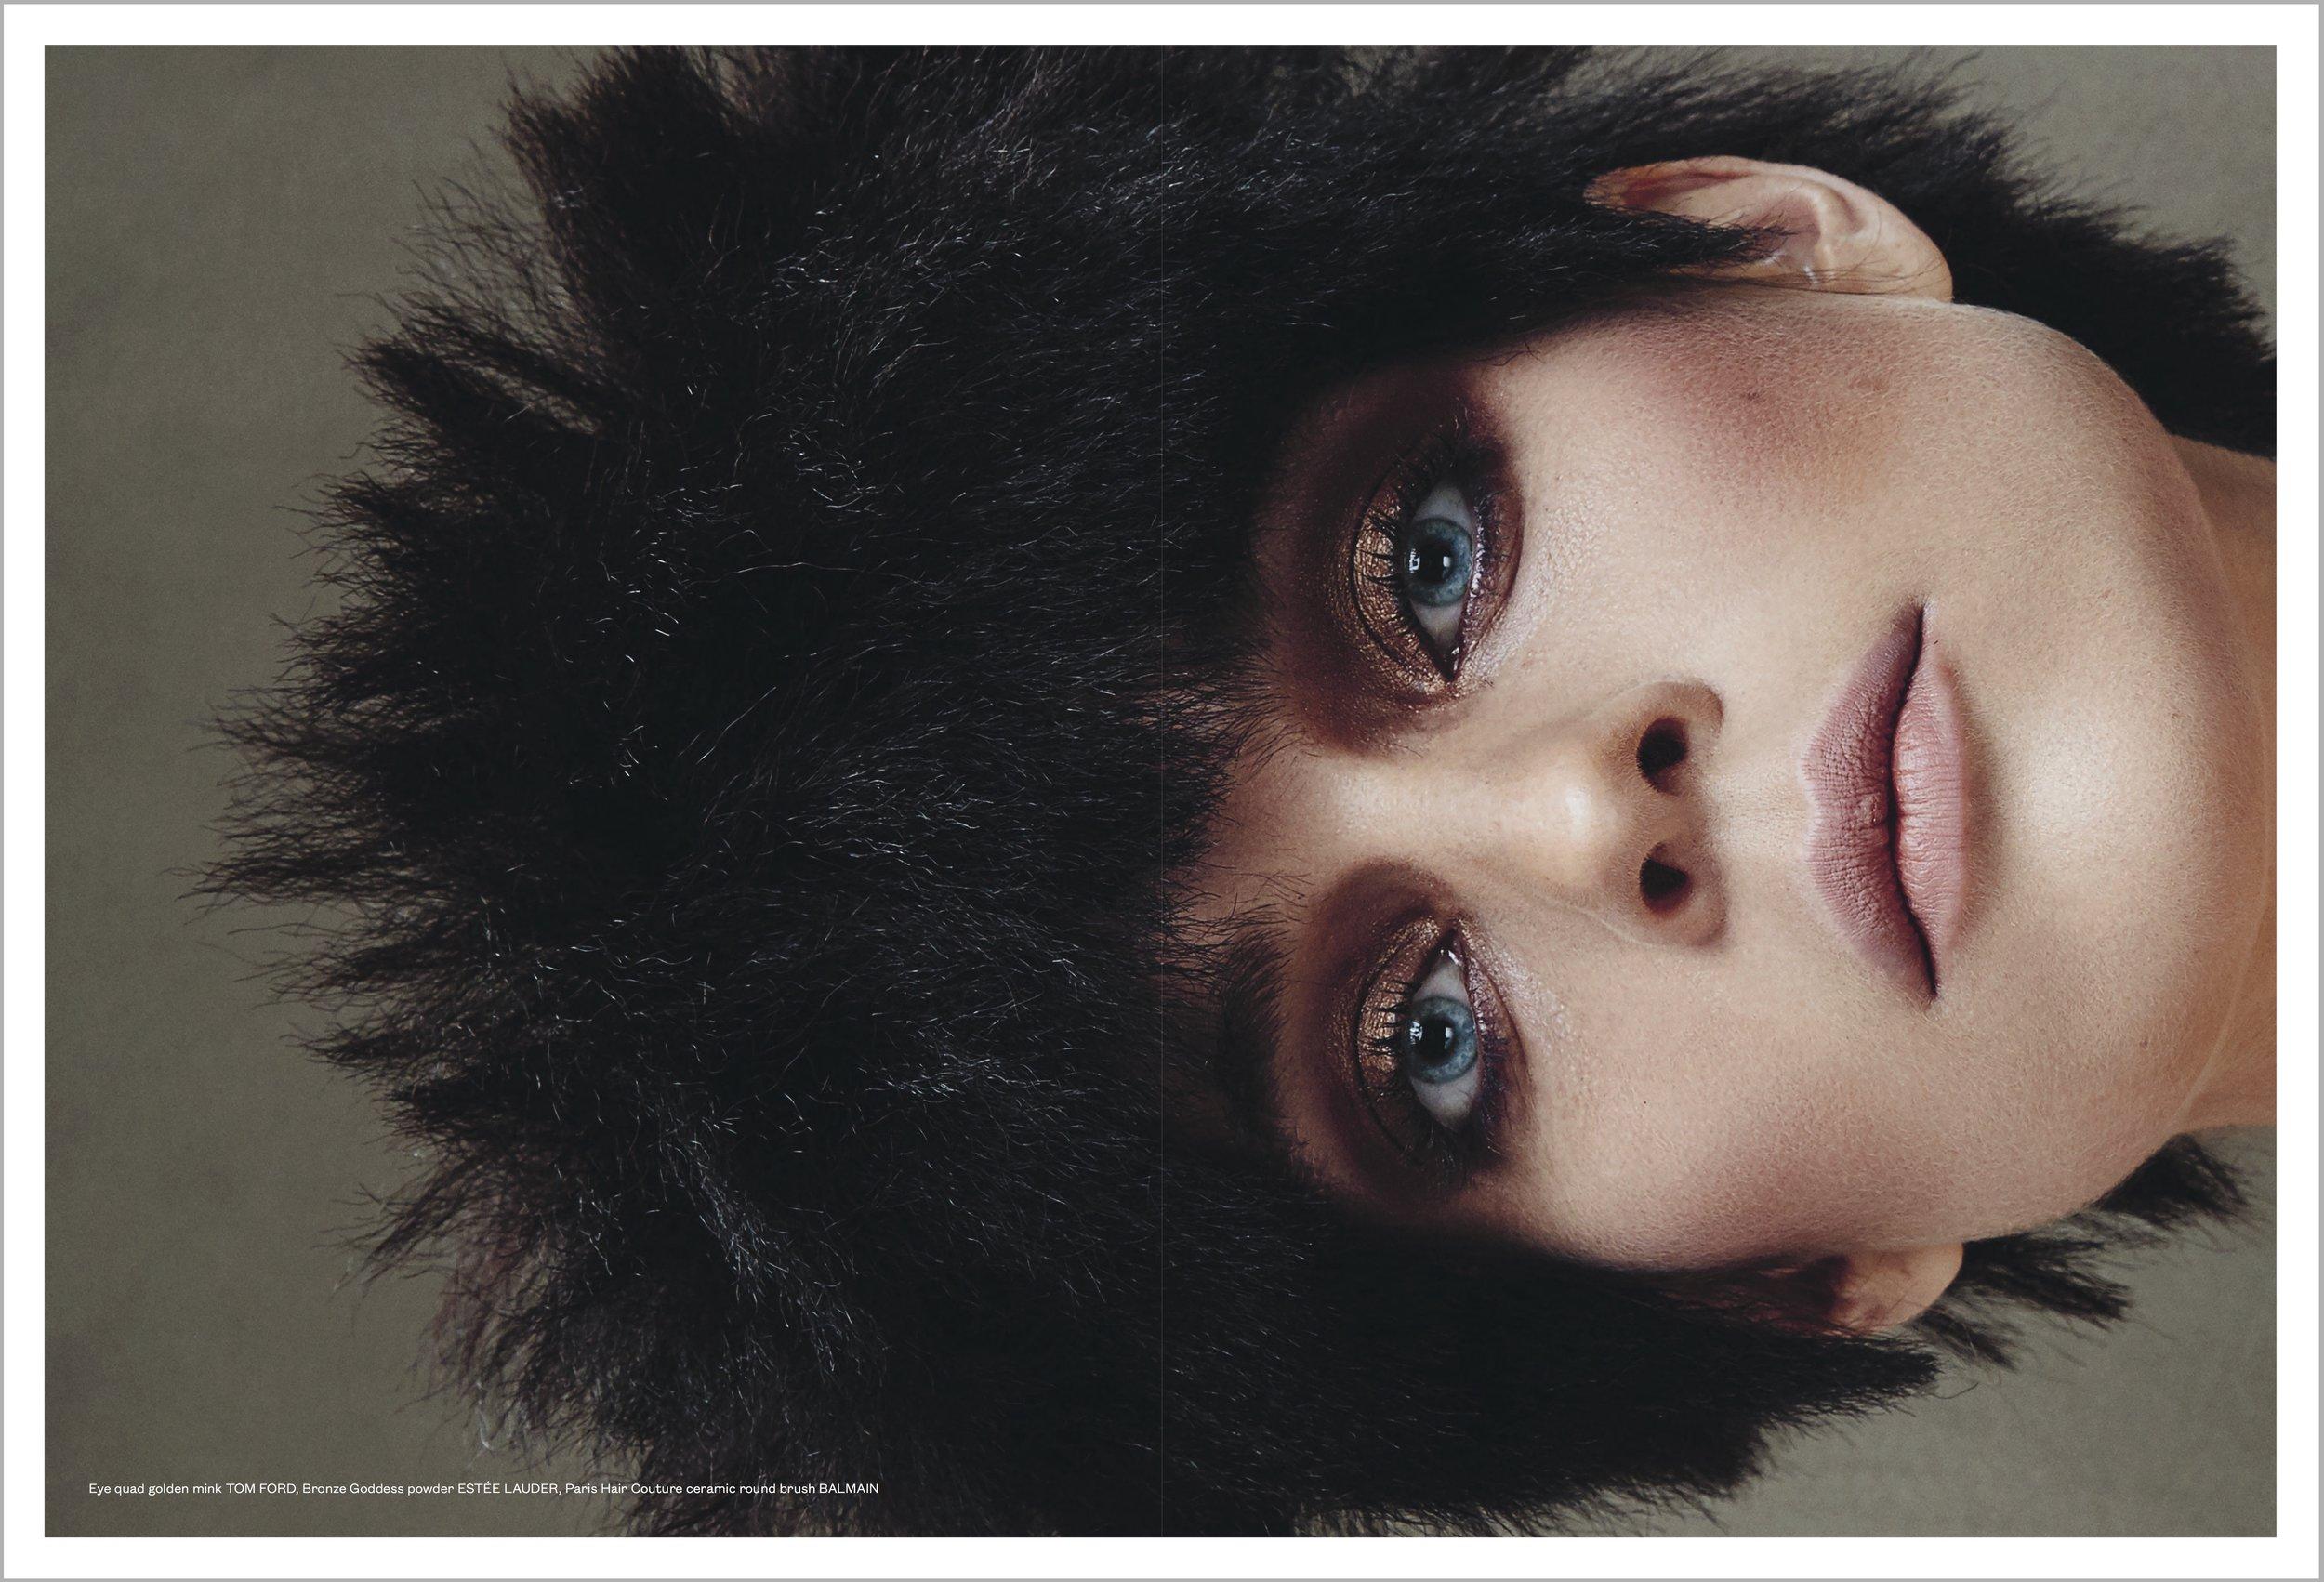 BeautyPapers#5 Mathew Kristal (dragged) 2 copy 3.jpg